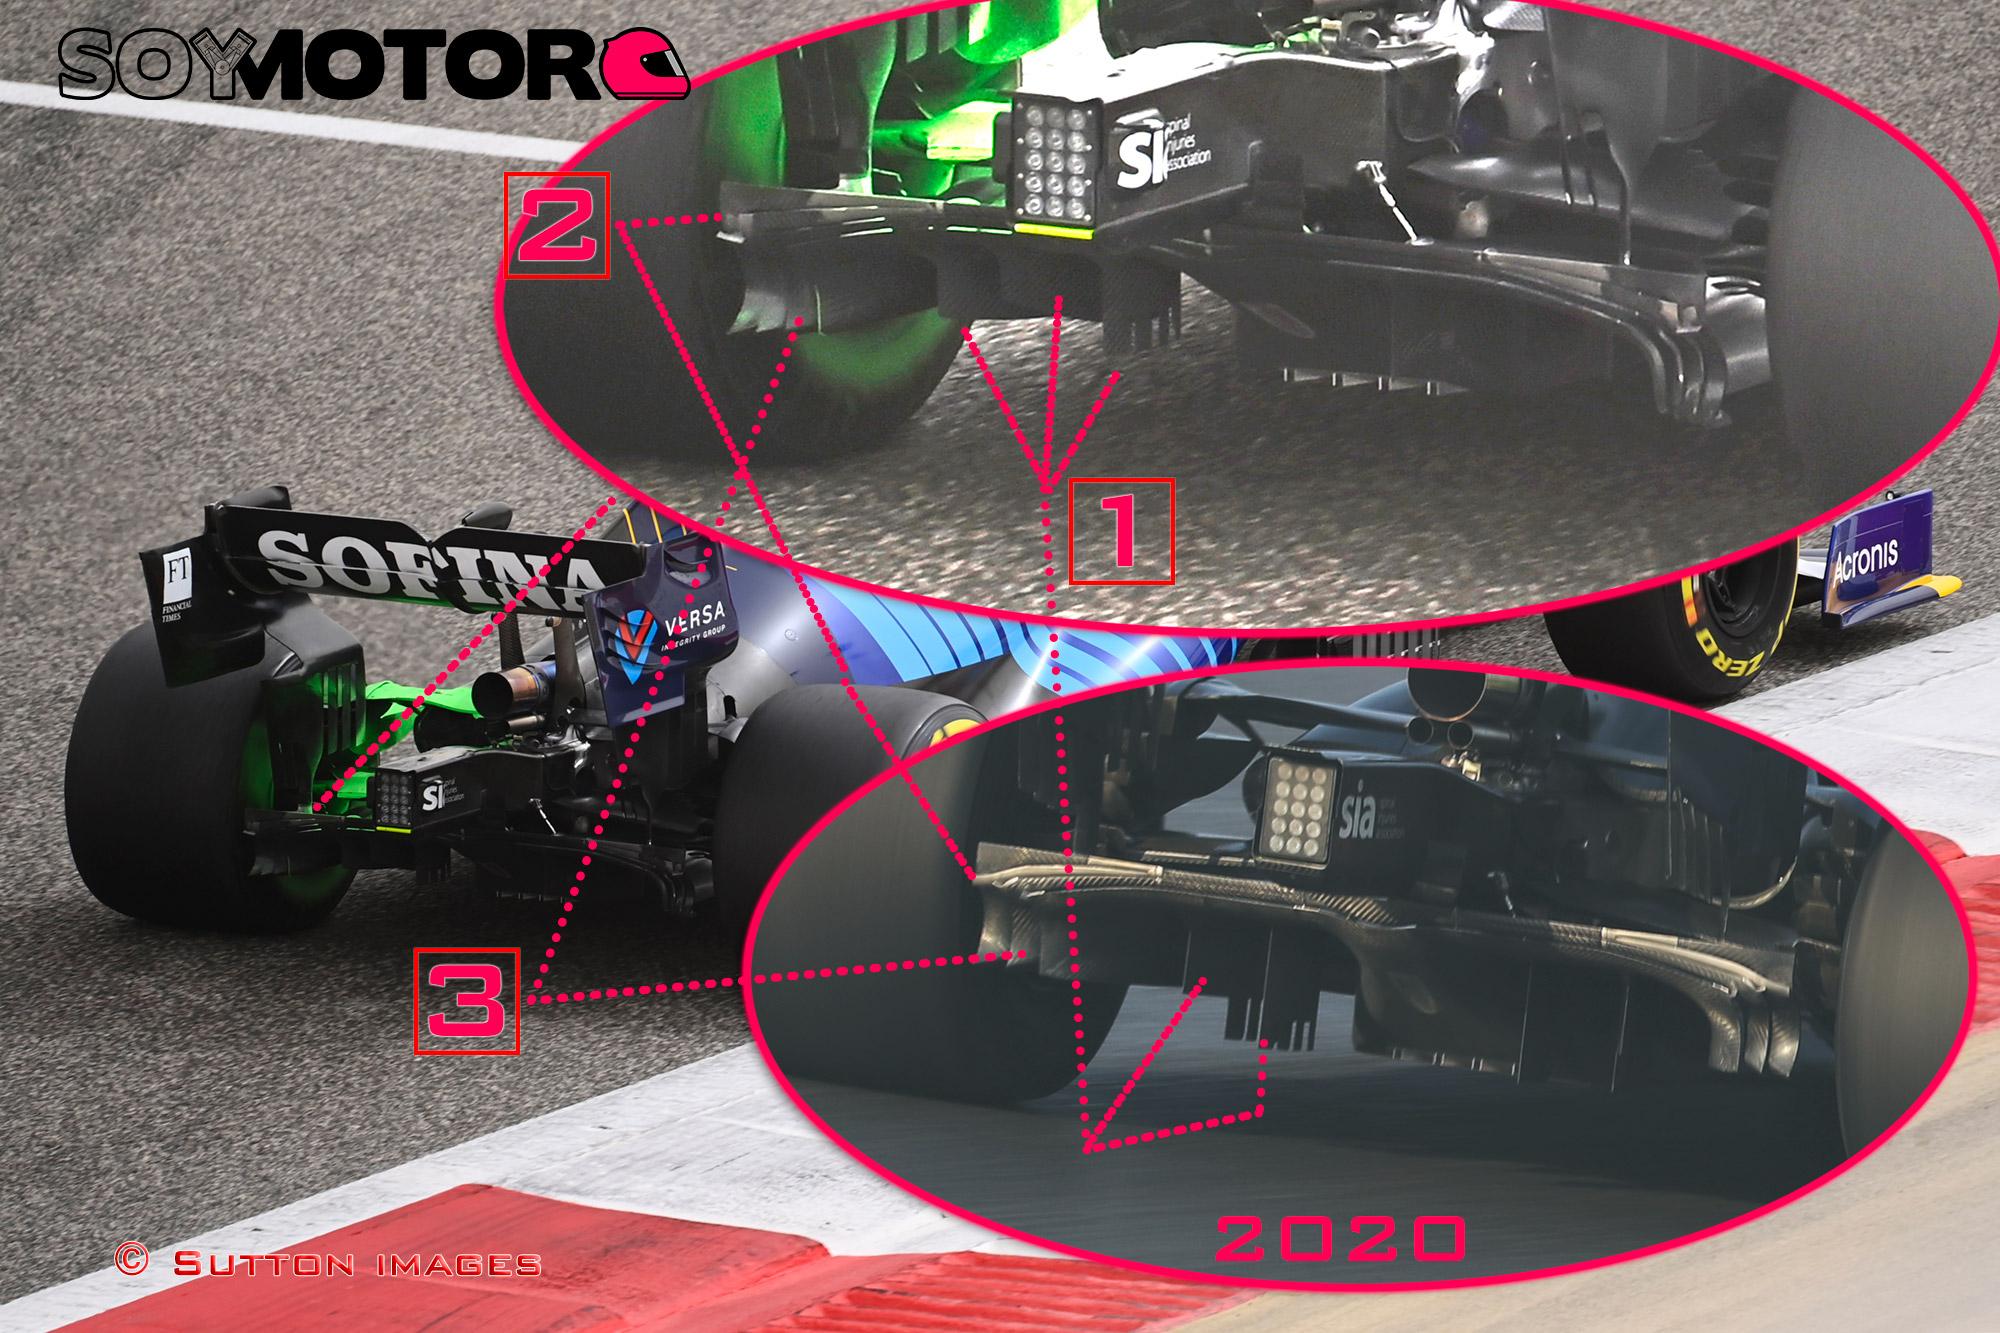 williams-difusor-soymotor_0.jpg